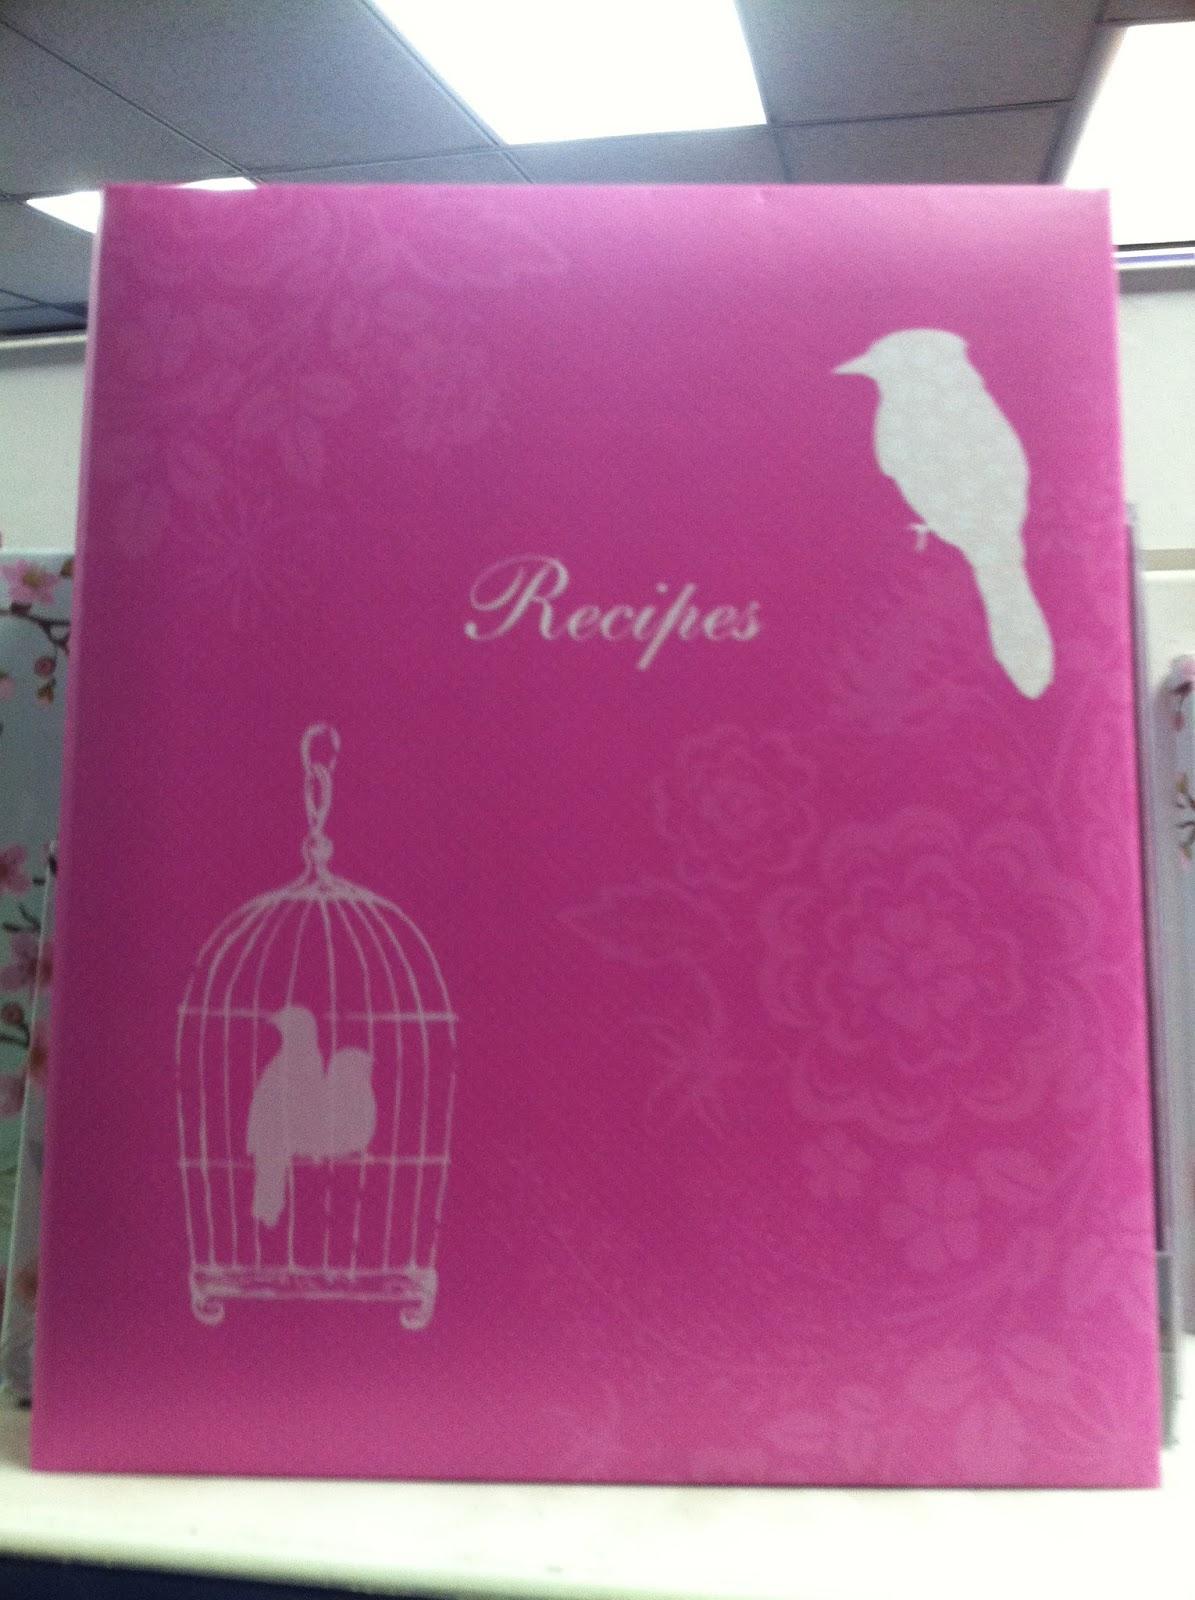 House Of Prints Whsmith 2014 Diaries